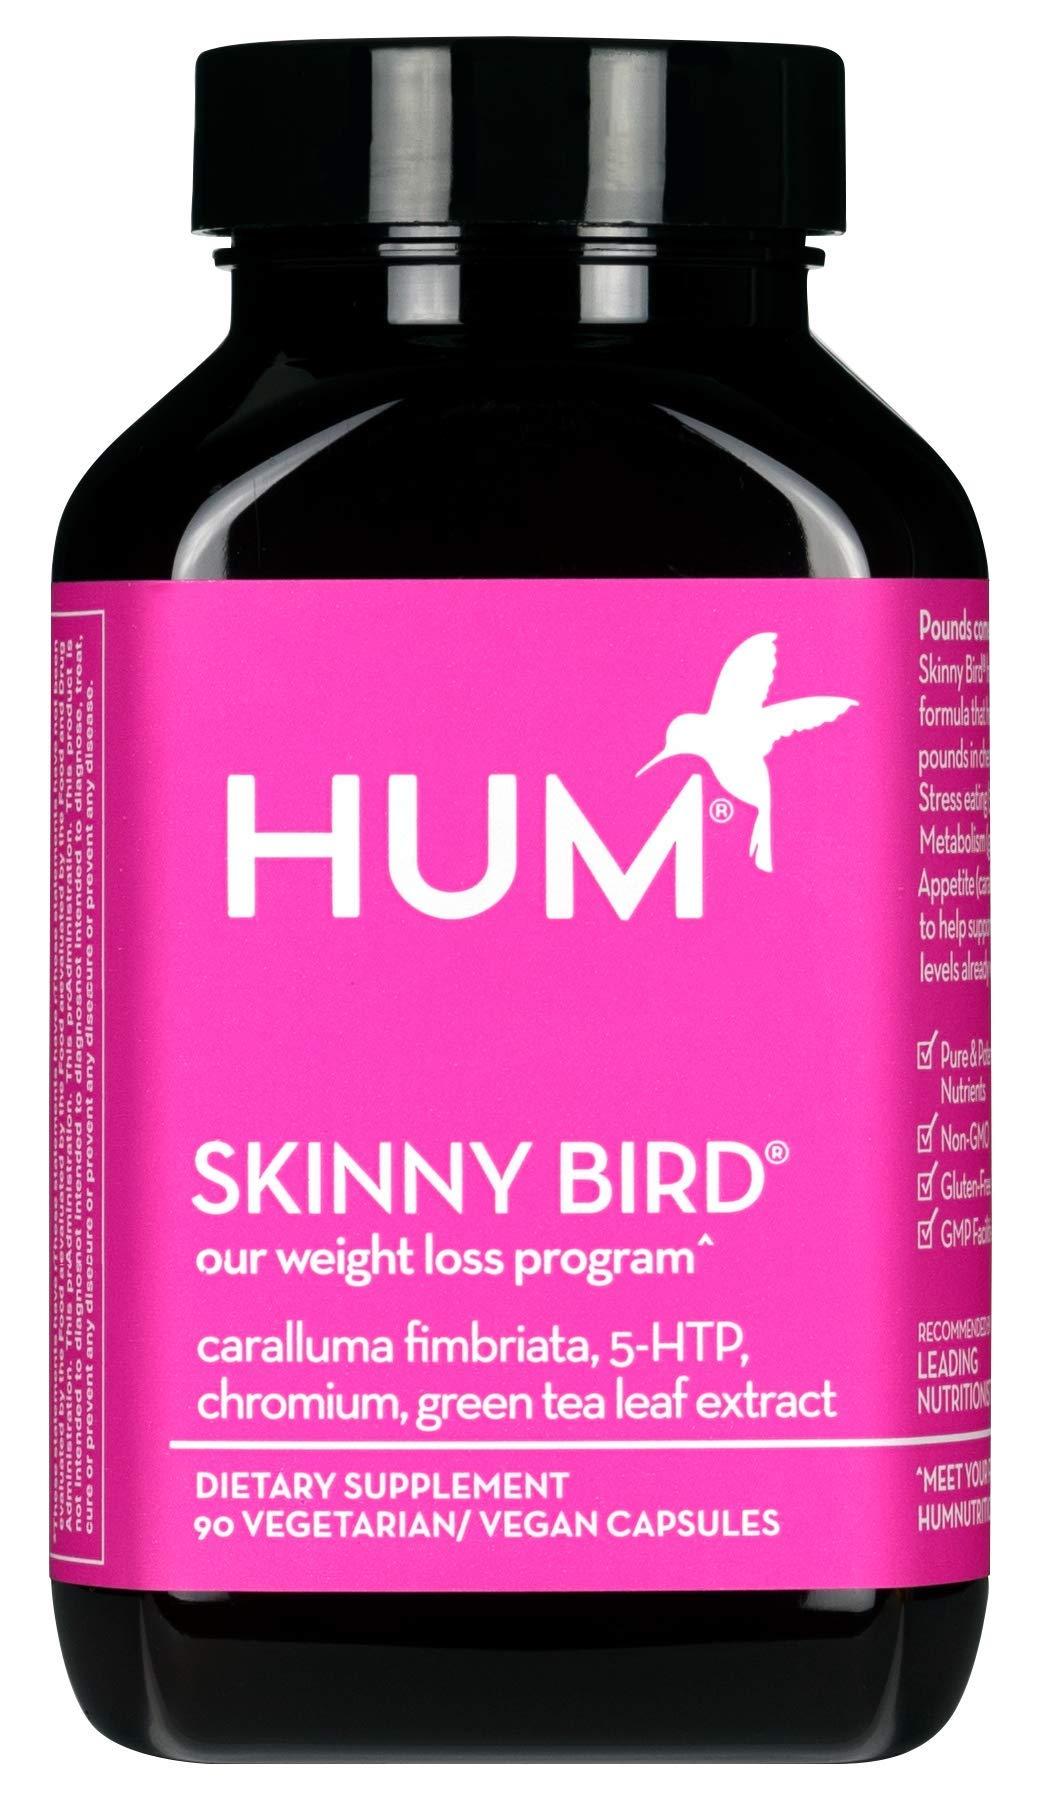 HUM Skinny Bird - Weight Management Support with Green Tea Extract, 5-HTP, Chromium & Caralluma Fimbriata (90 Vegan Capsules) by HUM